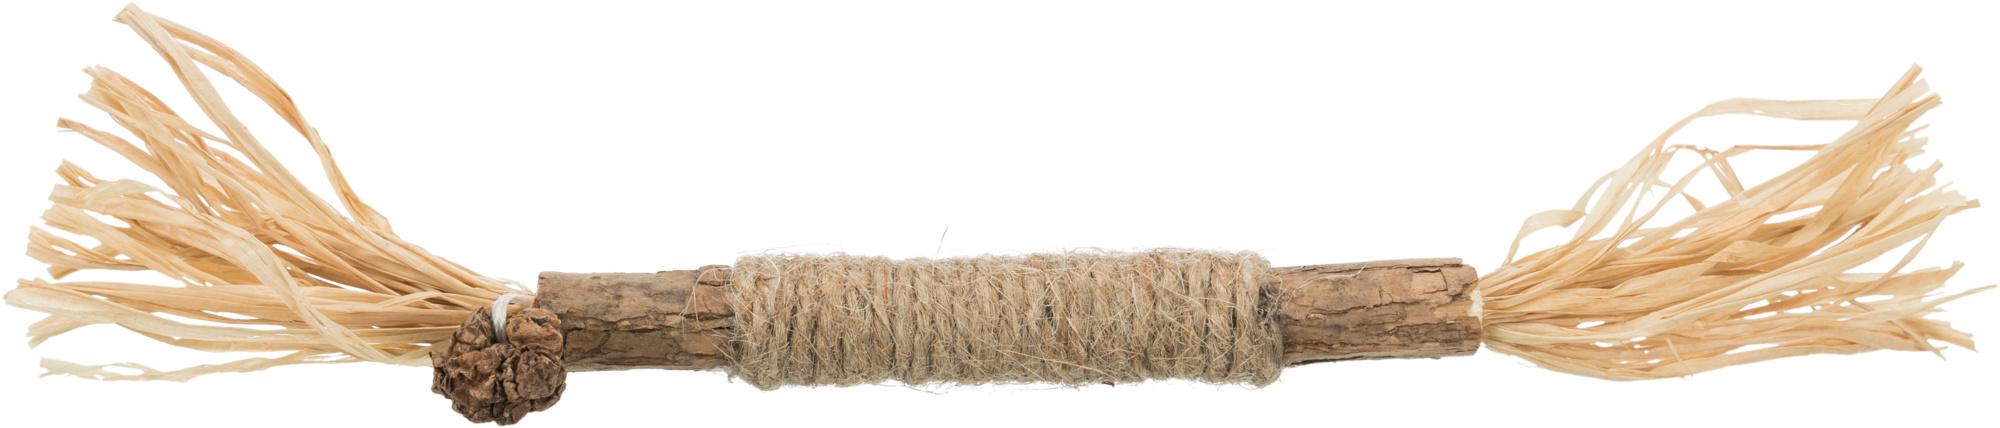 matabi stokje met franjes 24 cm